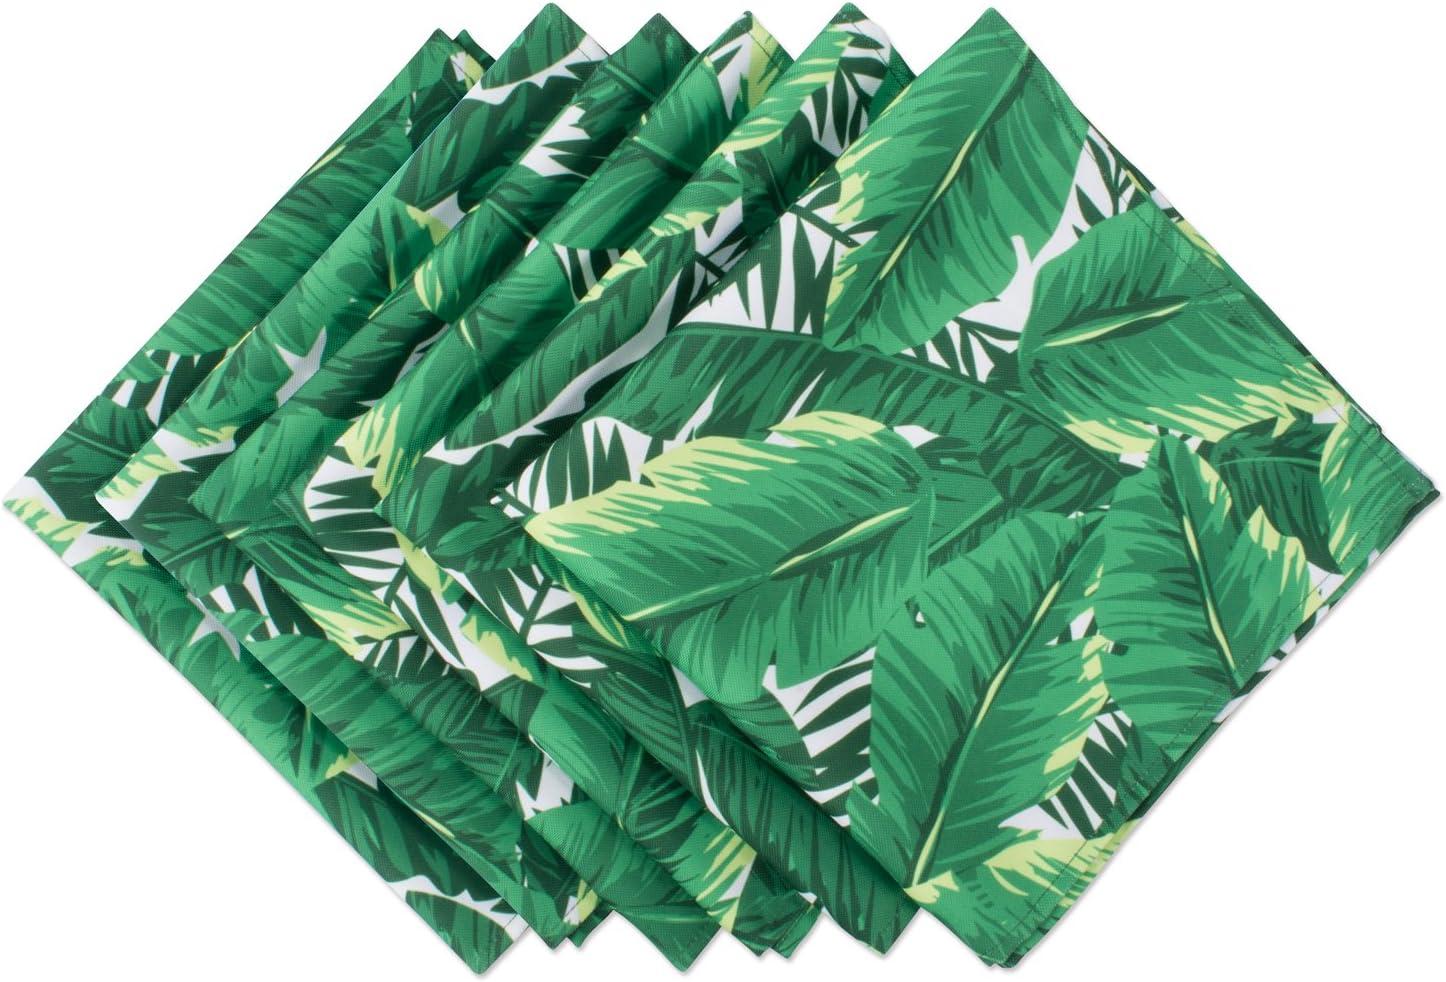 DII CAMZ37512 NP Outdoor Banana Leaf S/6, Napkins, 6 Count